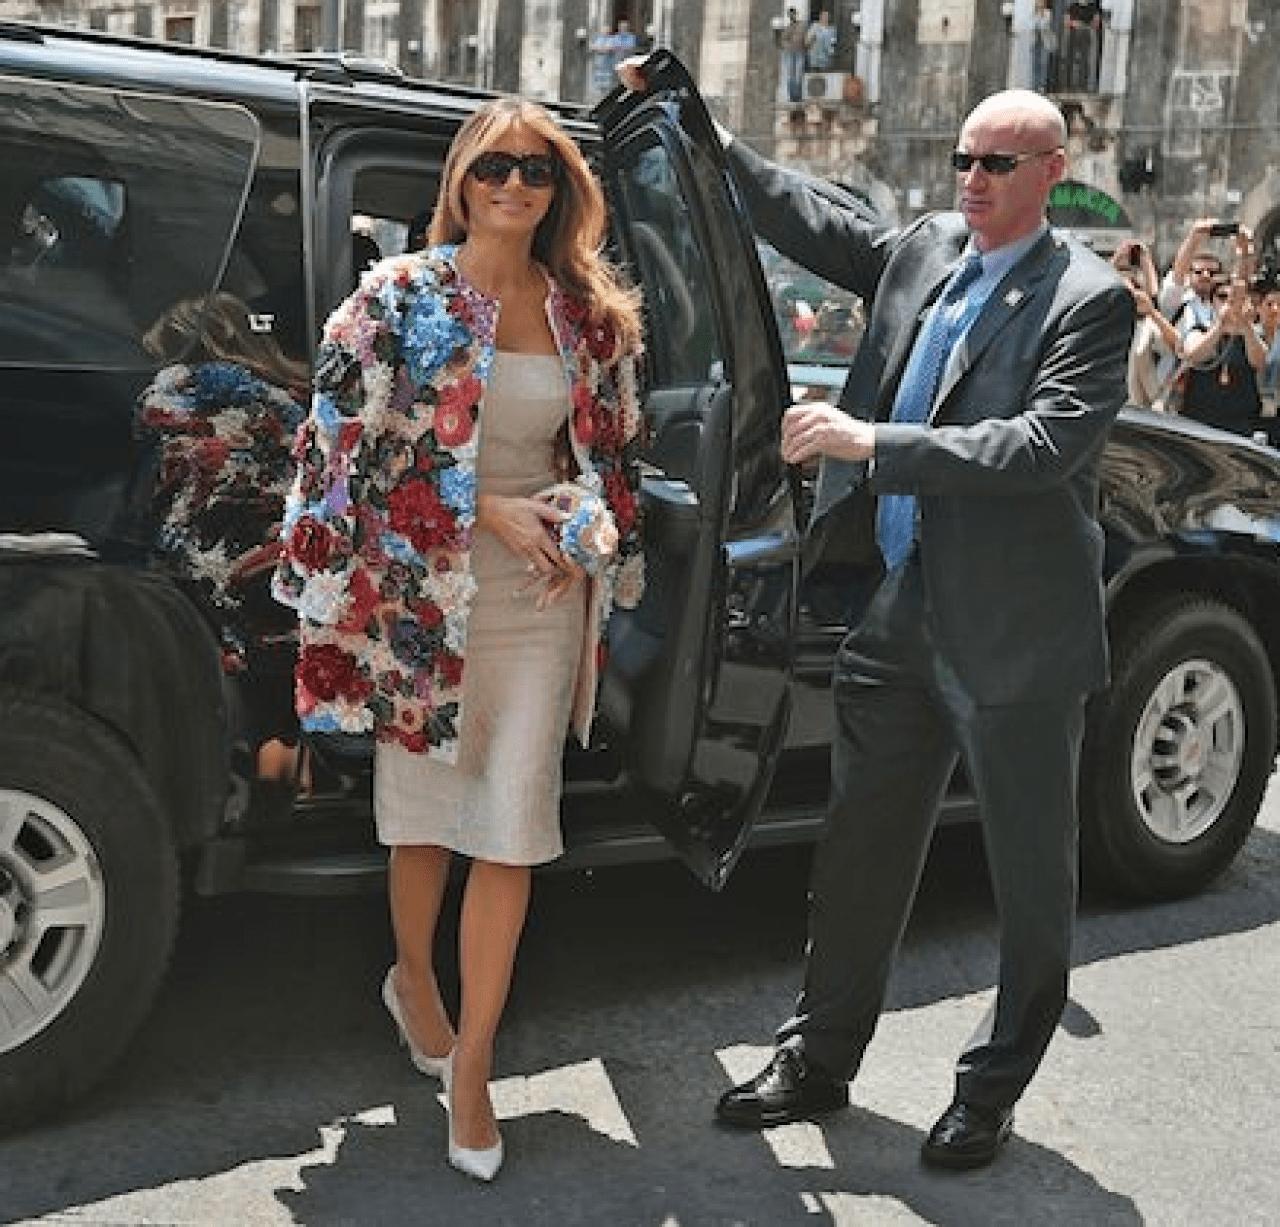 Melania G7 Summit May 26 2017 Sicily